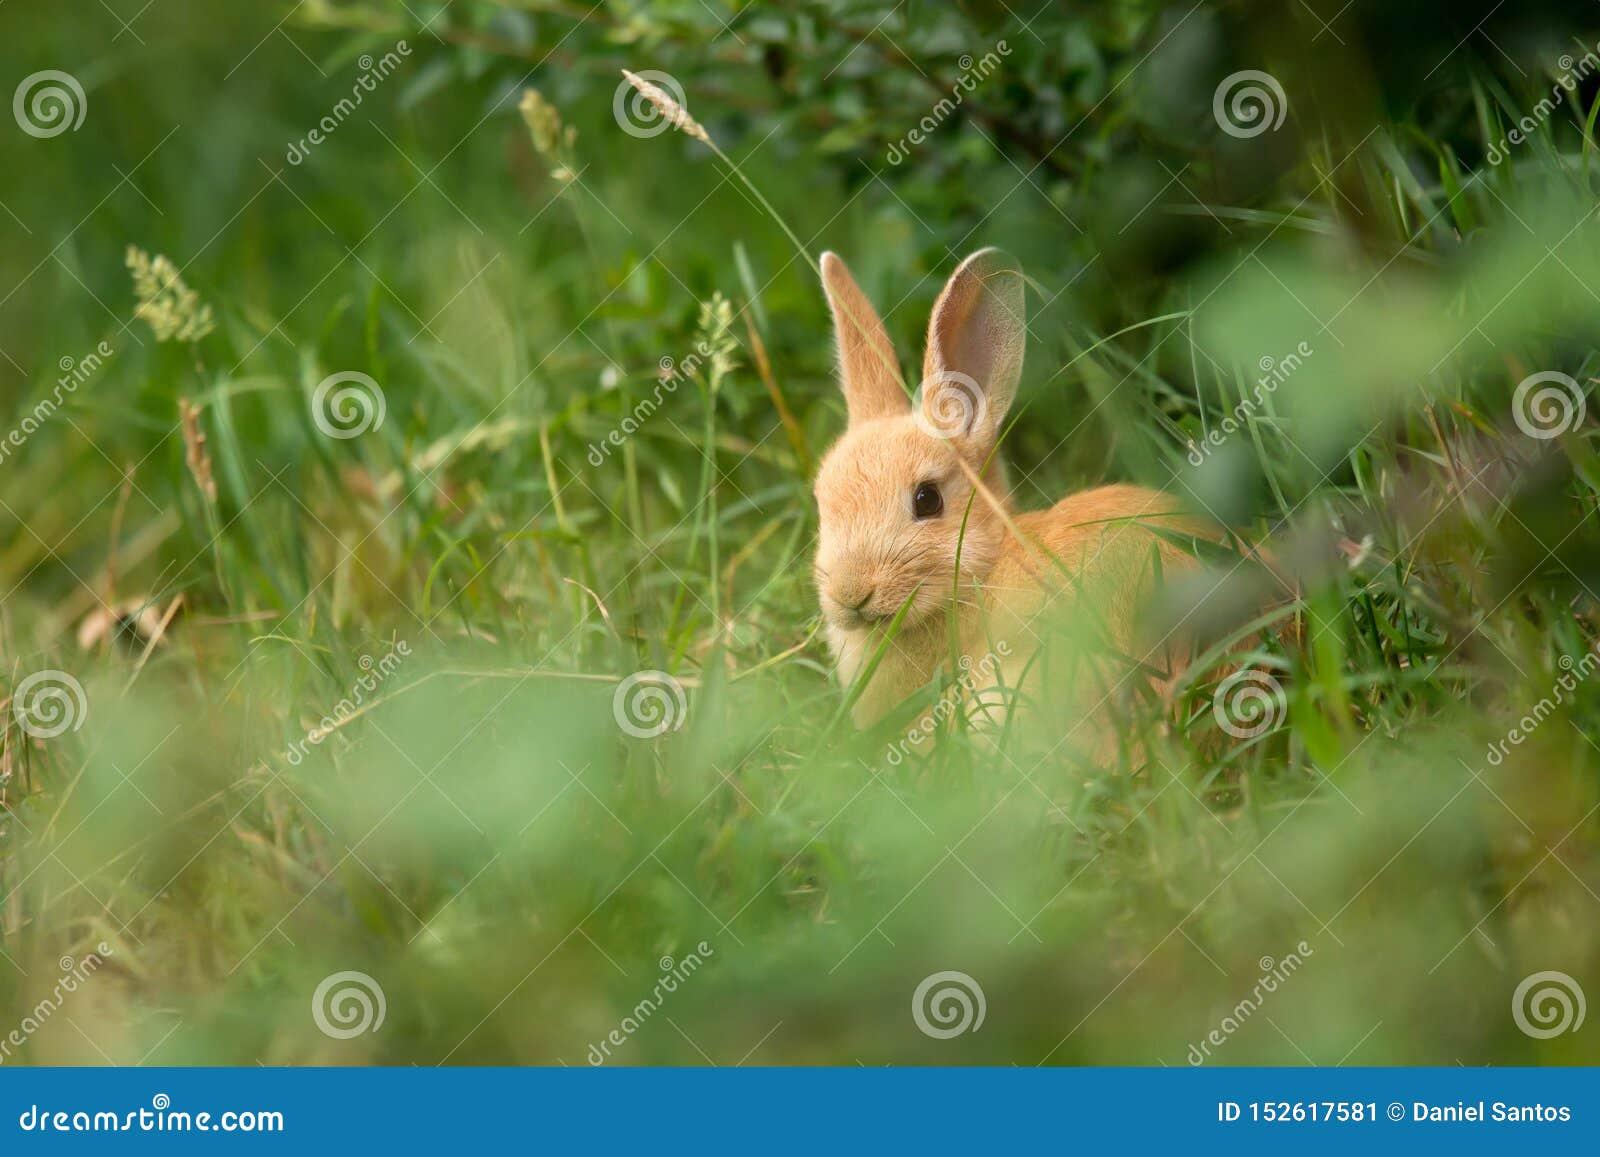 Cute beige rabbit in the grass